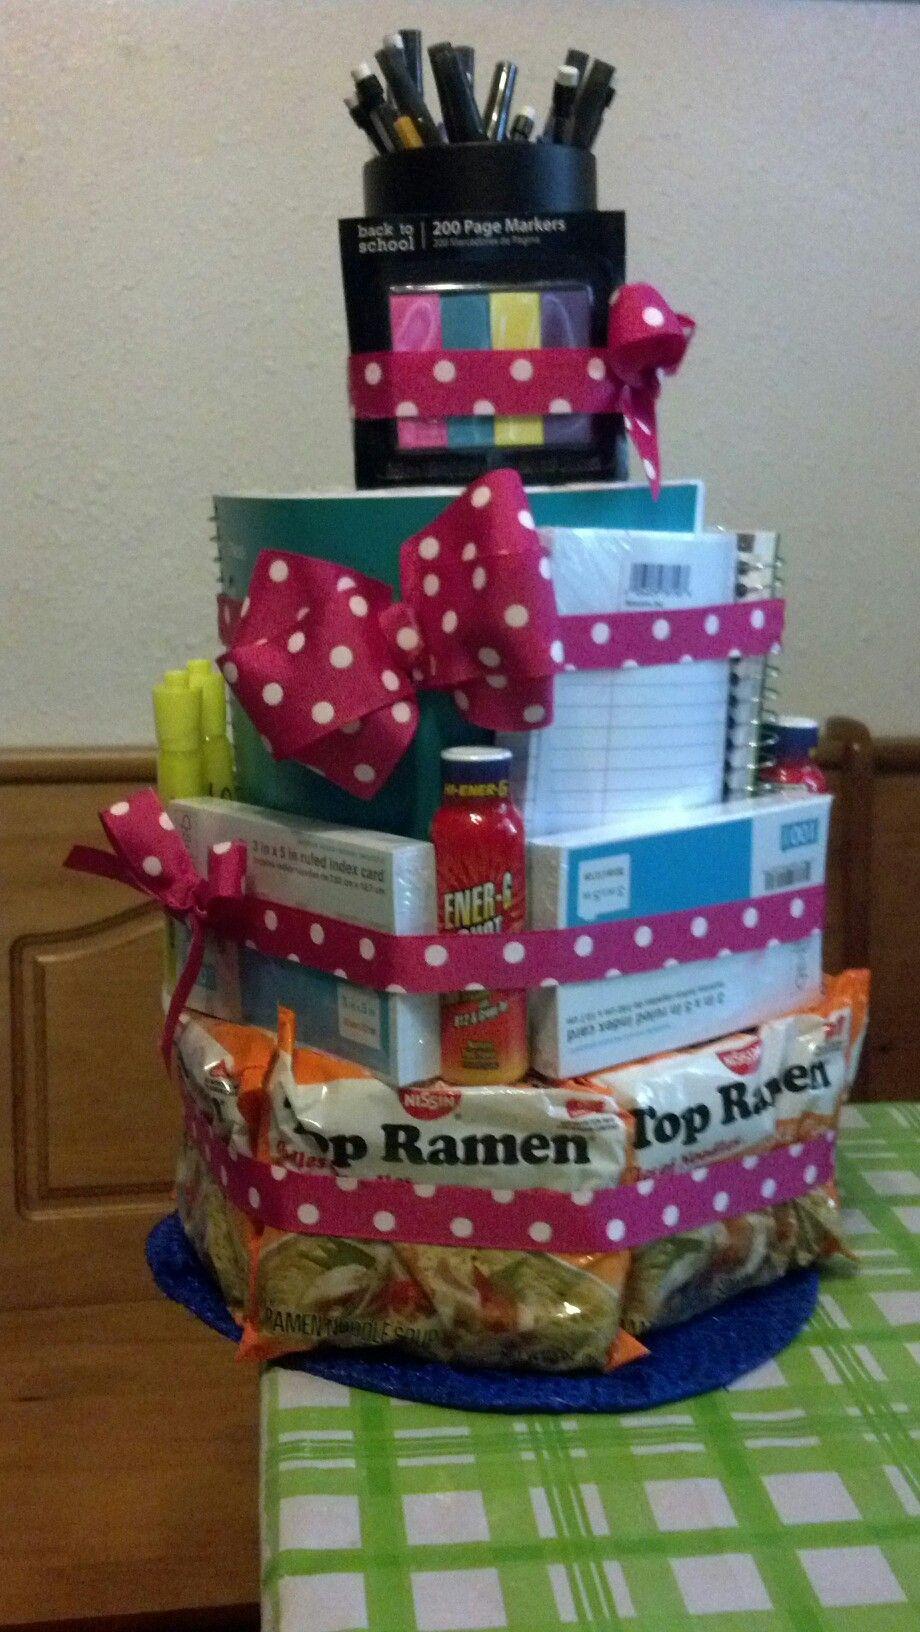 College Graduation Cakes on Pinterest | Graduation Cake, First Communion Invitations and Texas ...